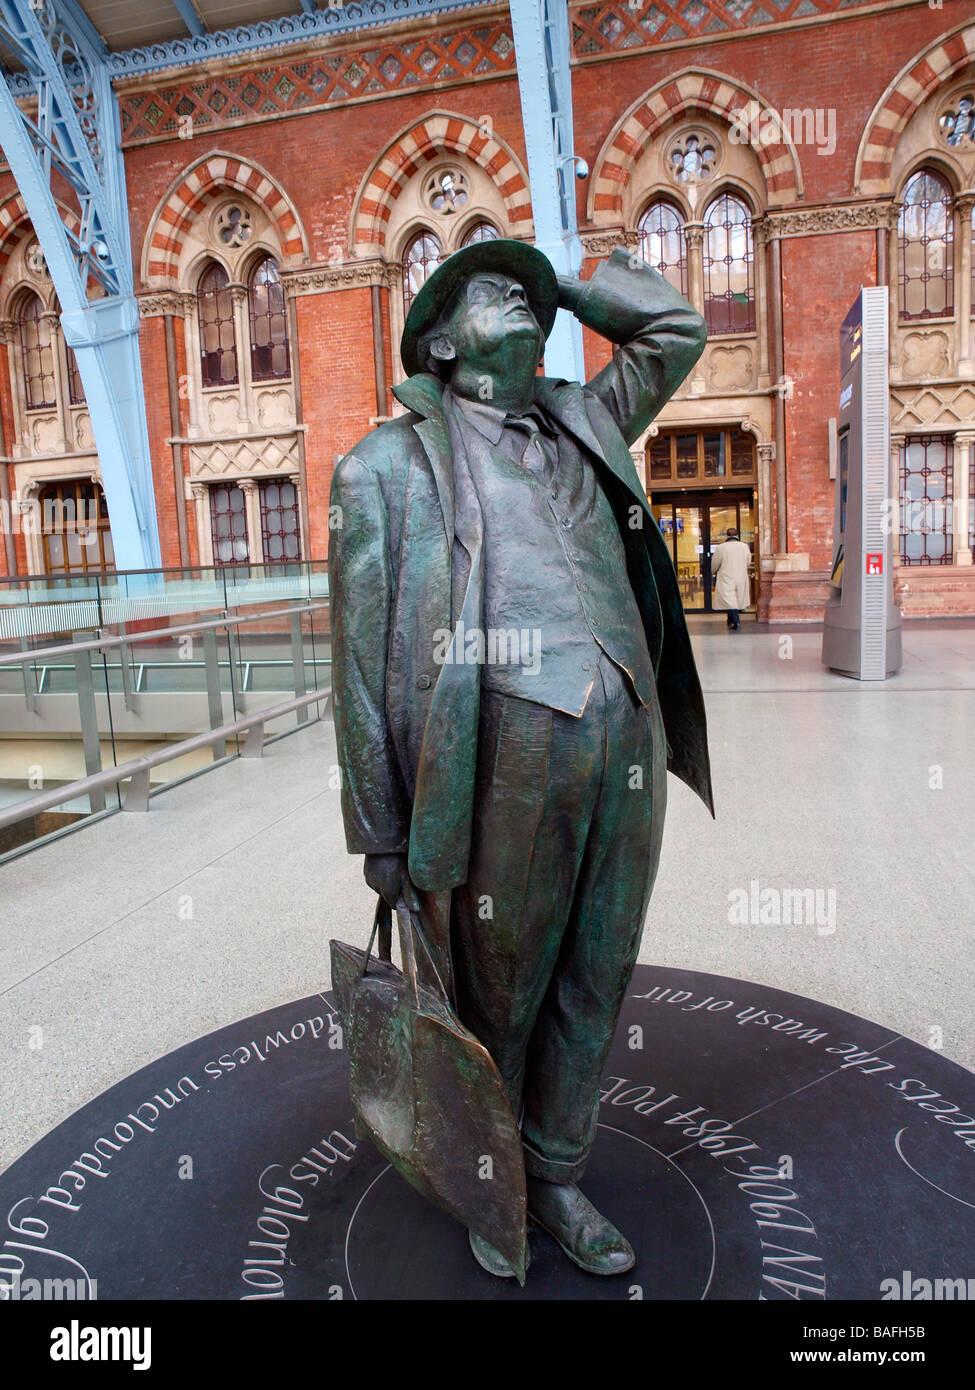 Martin Jennings sculpture Sir John Betjeman on the concourse at St Pancras Station London England - Stock Image